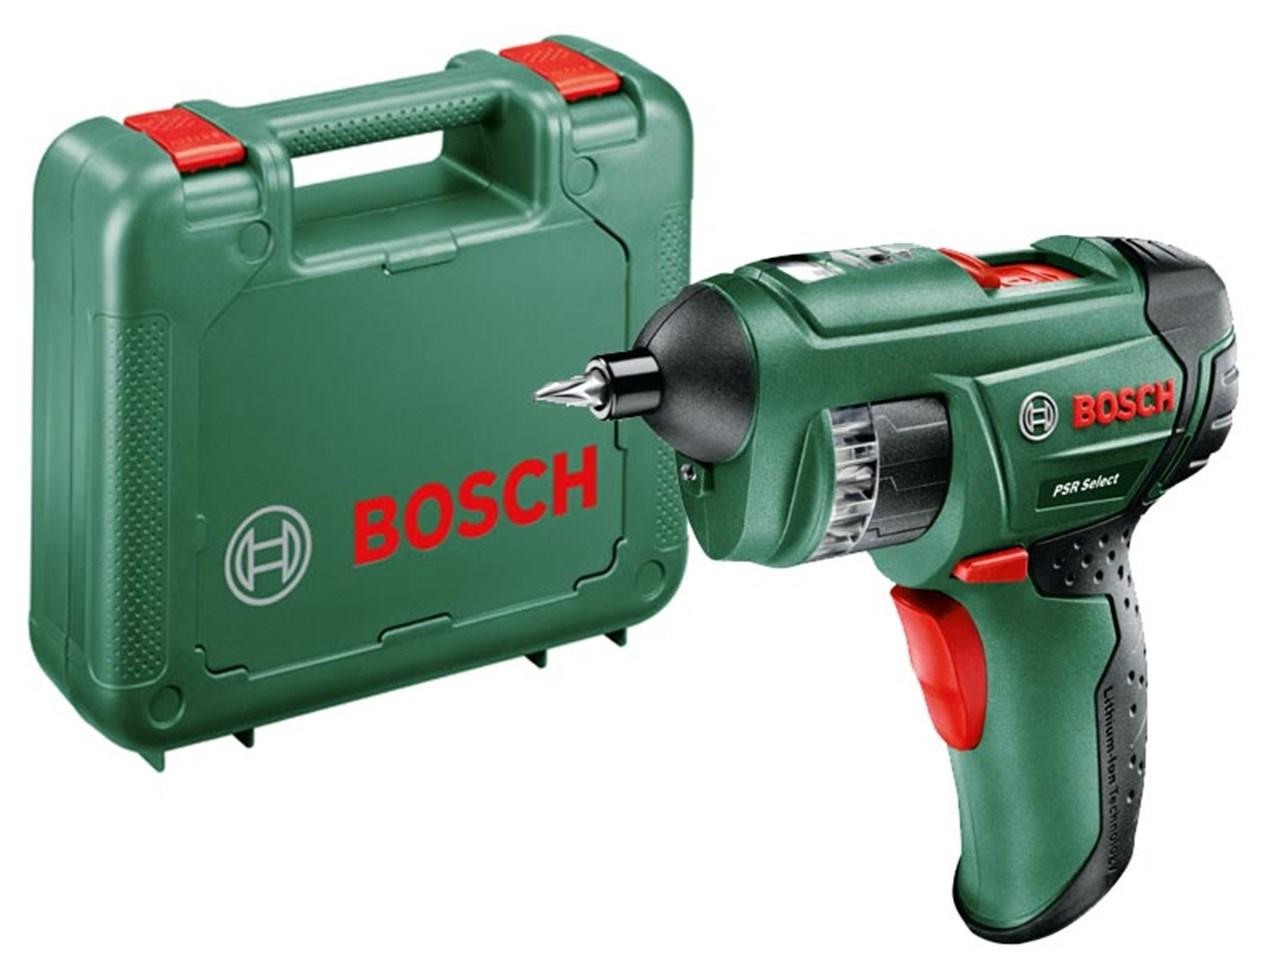 bosch green psr select cordless screwdriver li ion. Black Bedroom Furniture Sets. Home Design Ideas